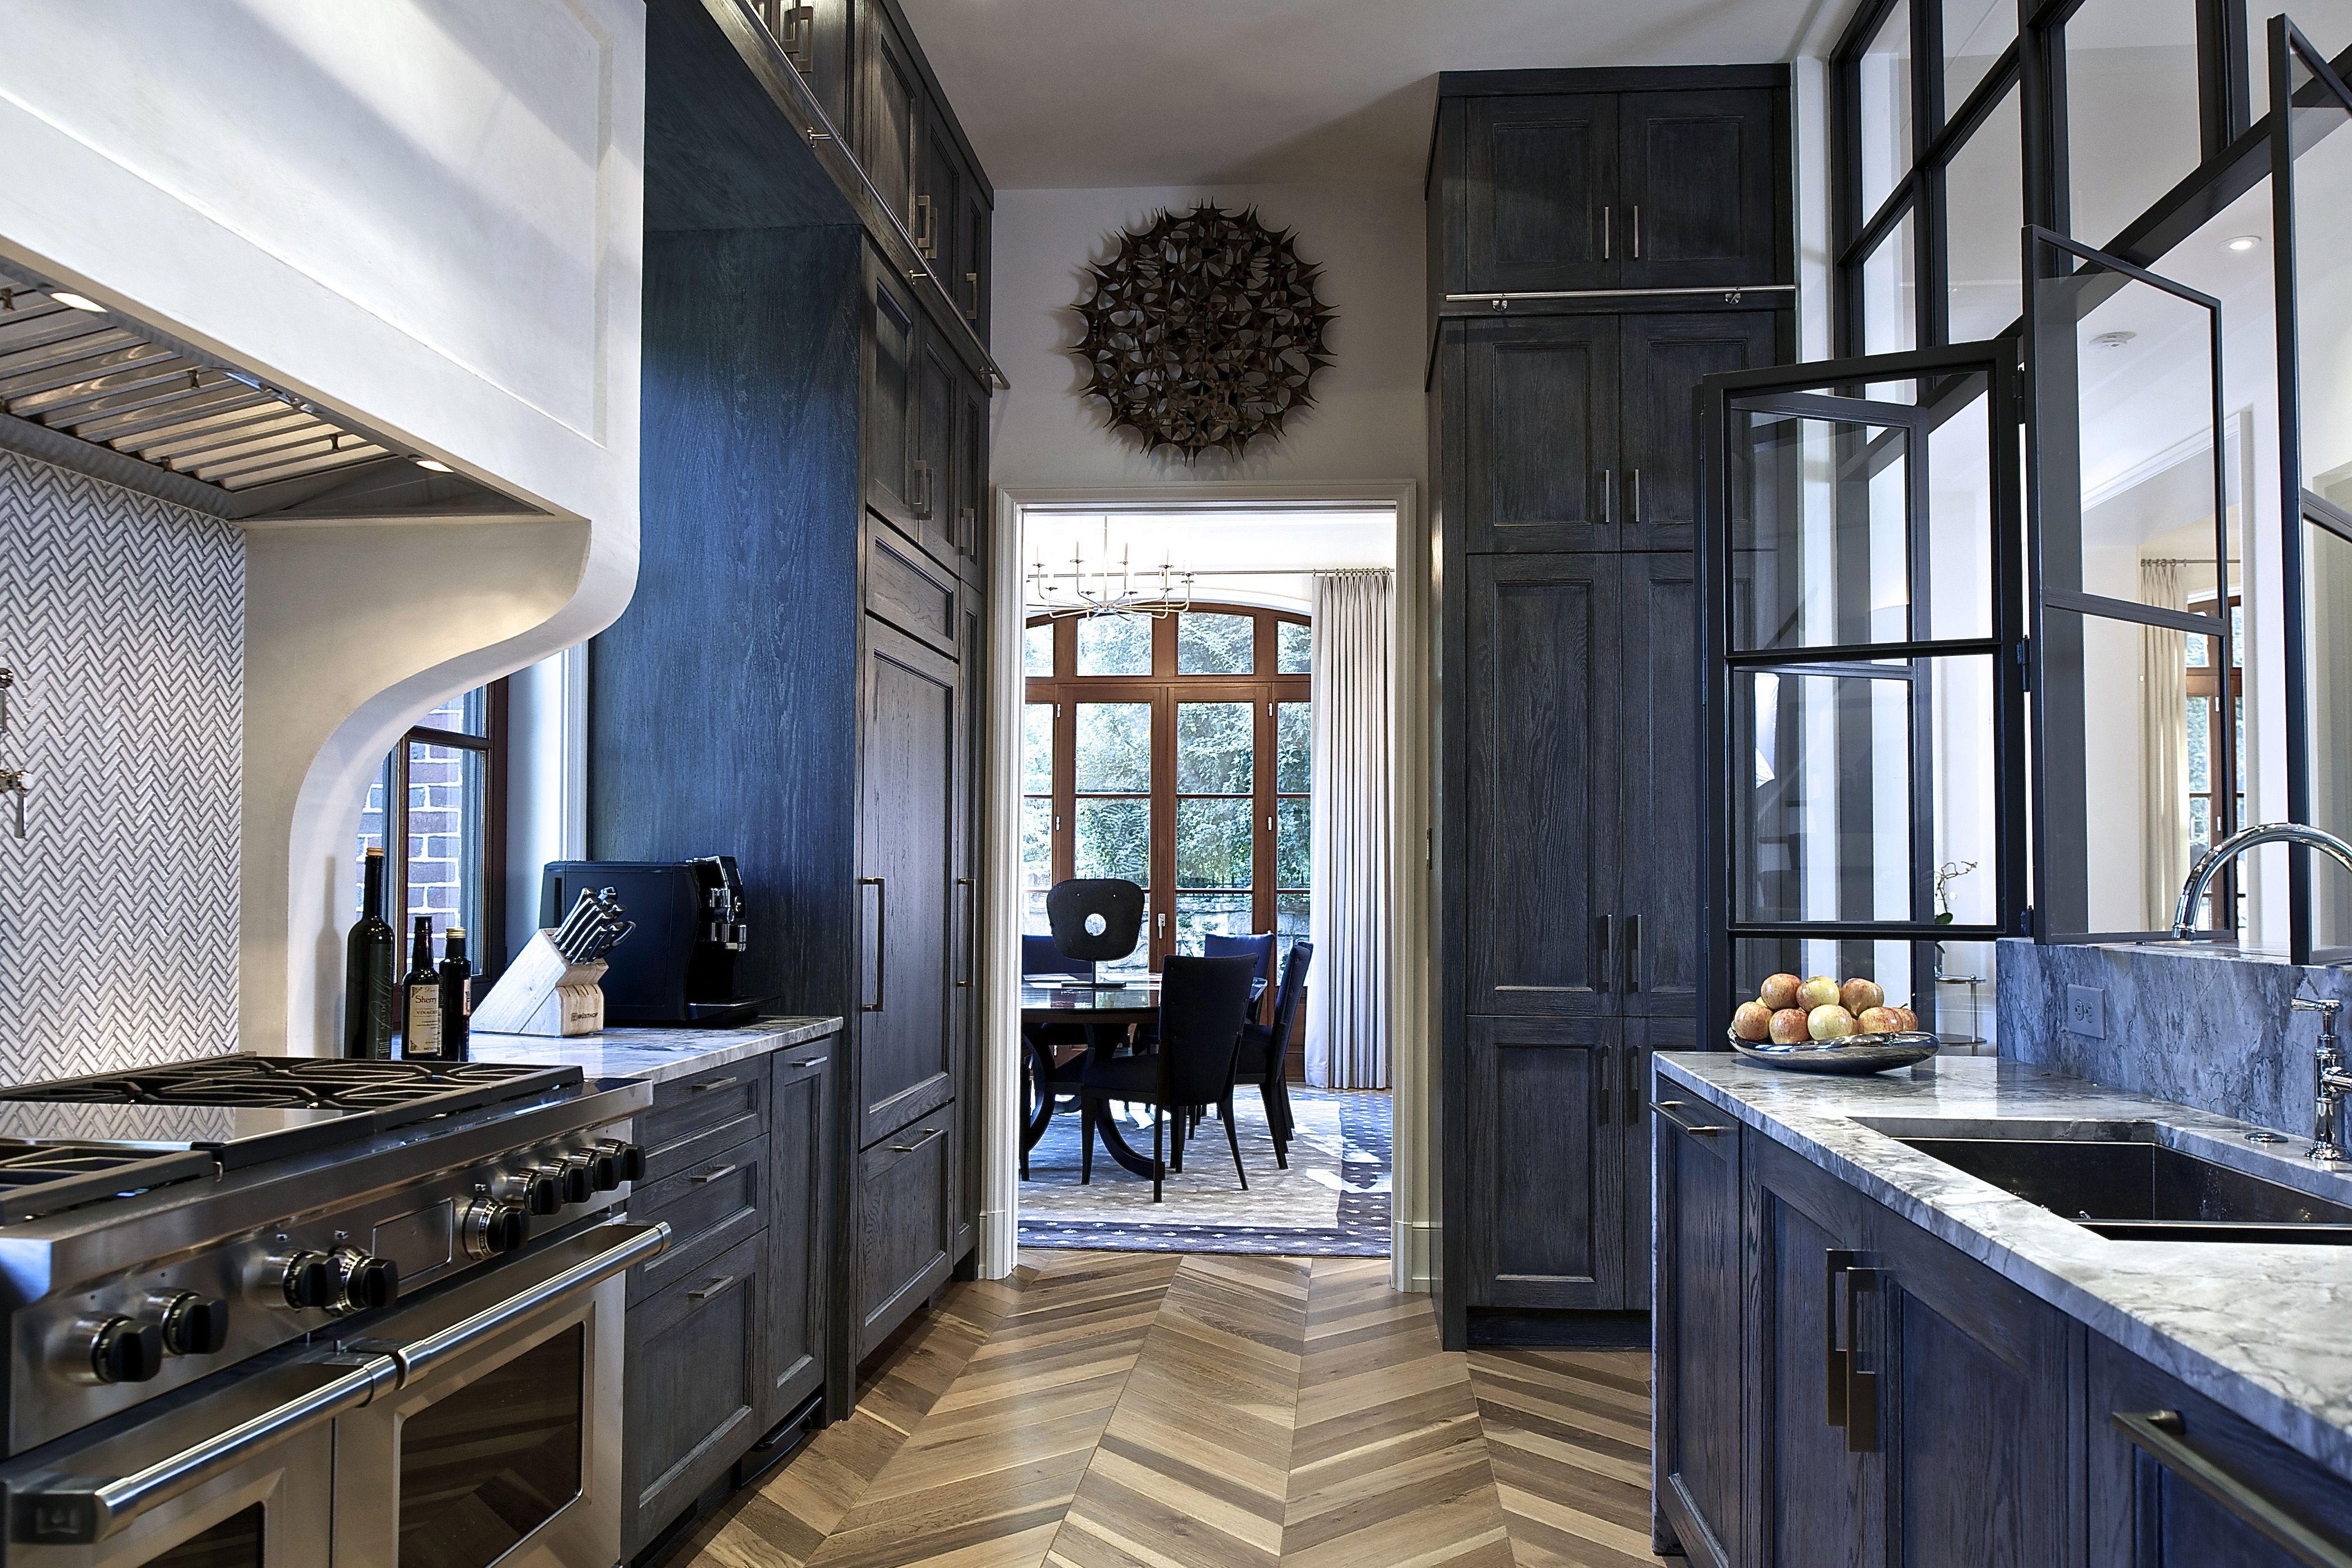 Beautiful Blue Kitchen Design Ideas on kitchen ideas white and blue, kitchen paint color ideas, kitchen remodel with blue countertops, kitchen with blue flowers, kitchen flooring ideas,